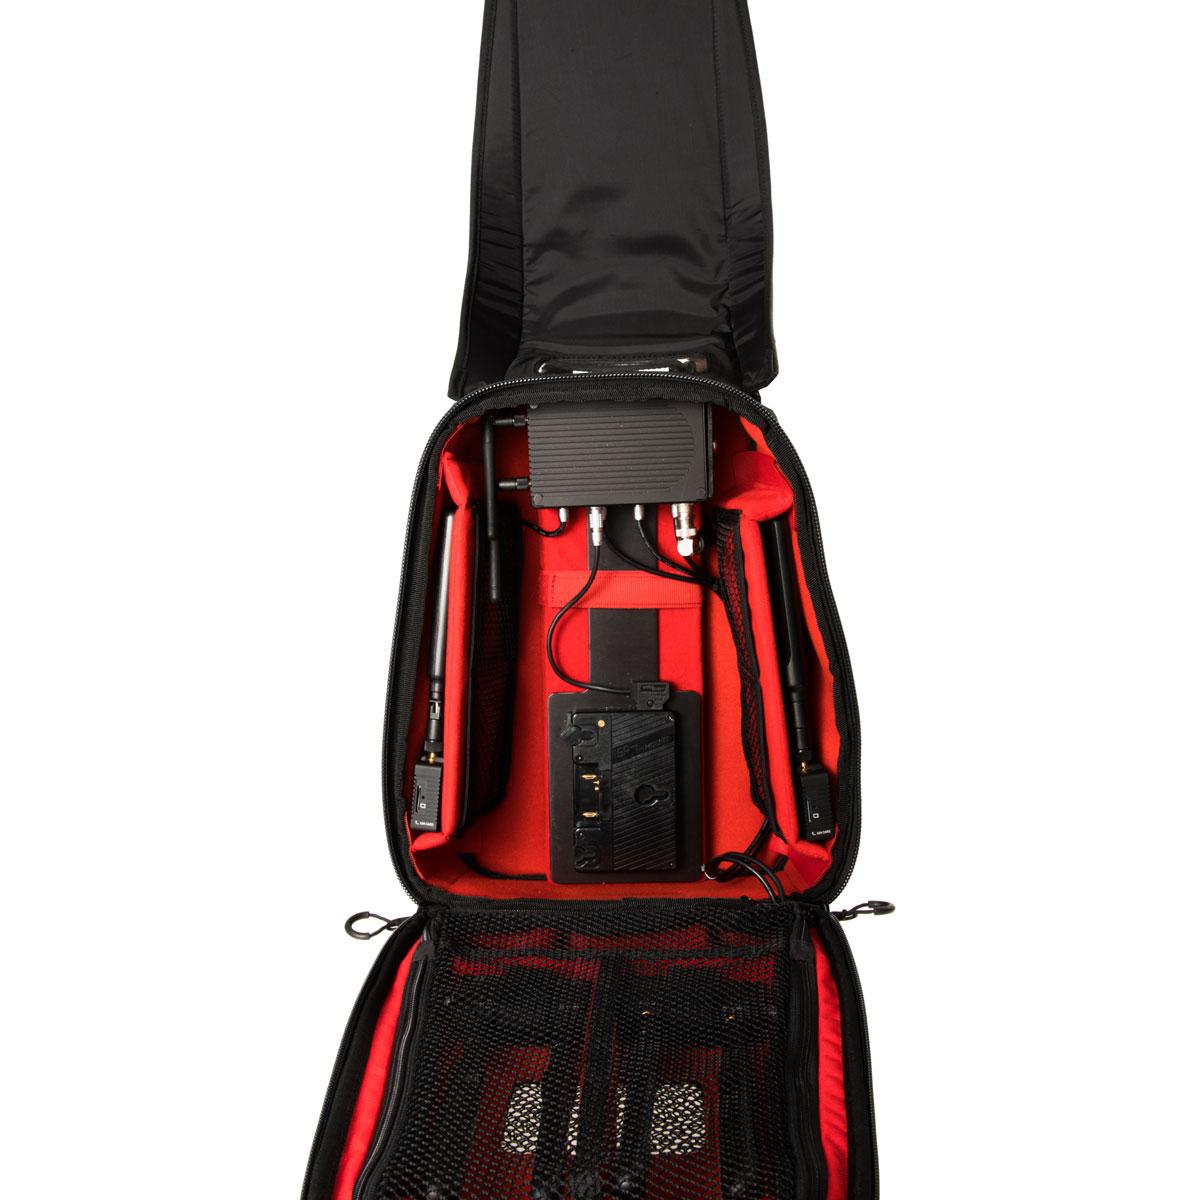 Bond 659 - Bond AVC Backpack + MPEG-TS - 4 Nodes Japan / V-Mount